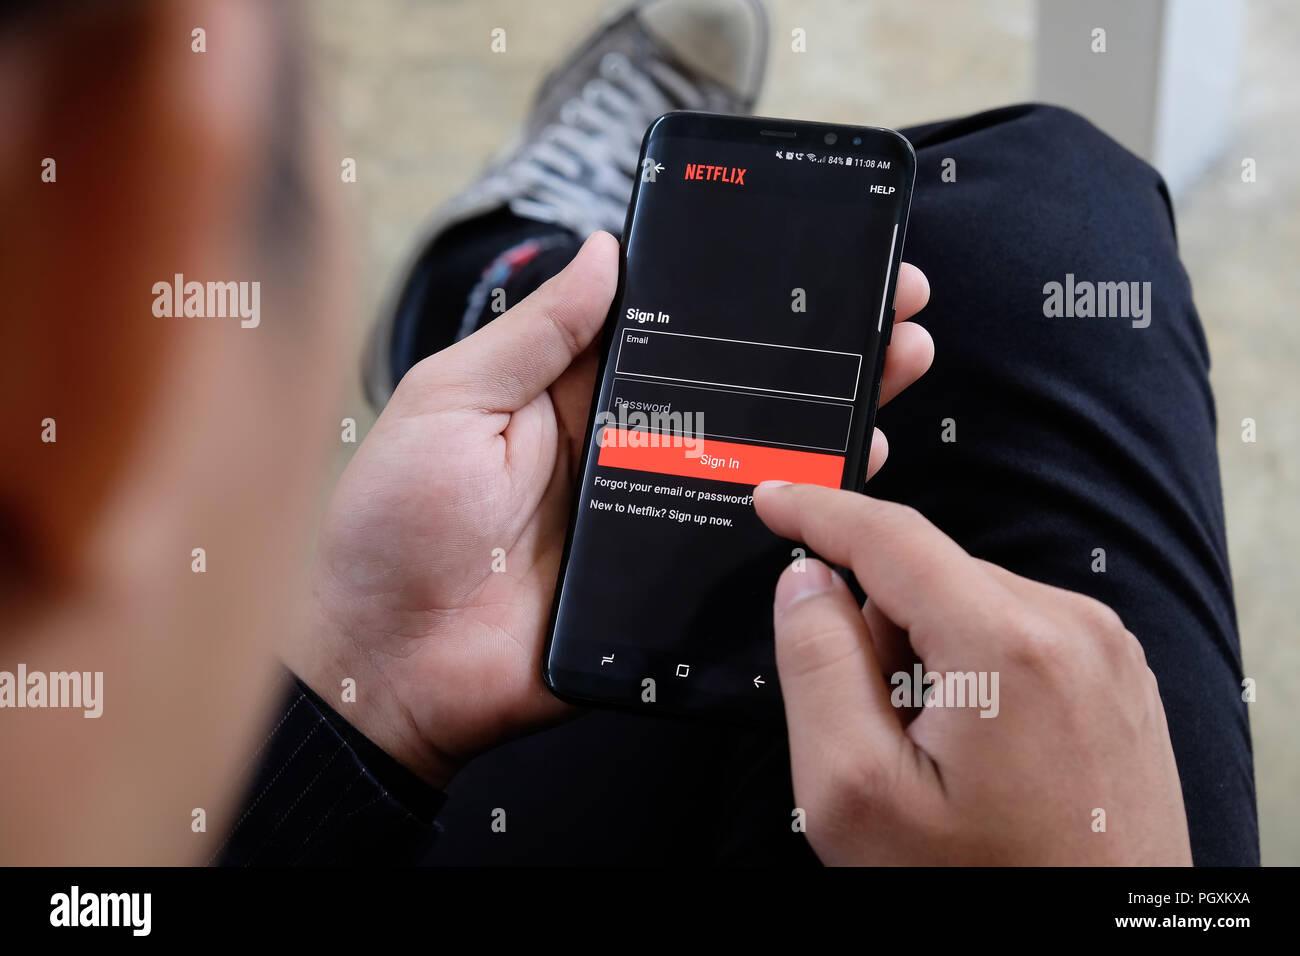 CHIANGMAI,THAILAND - August 22,2018: A Man opening Netflix in